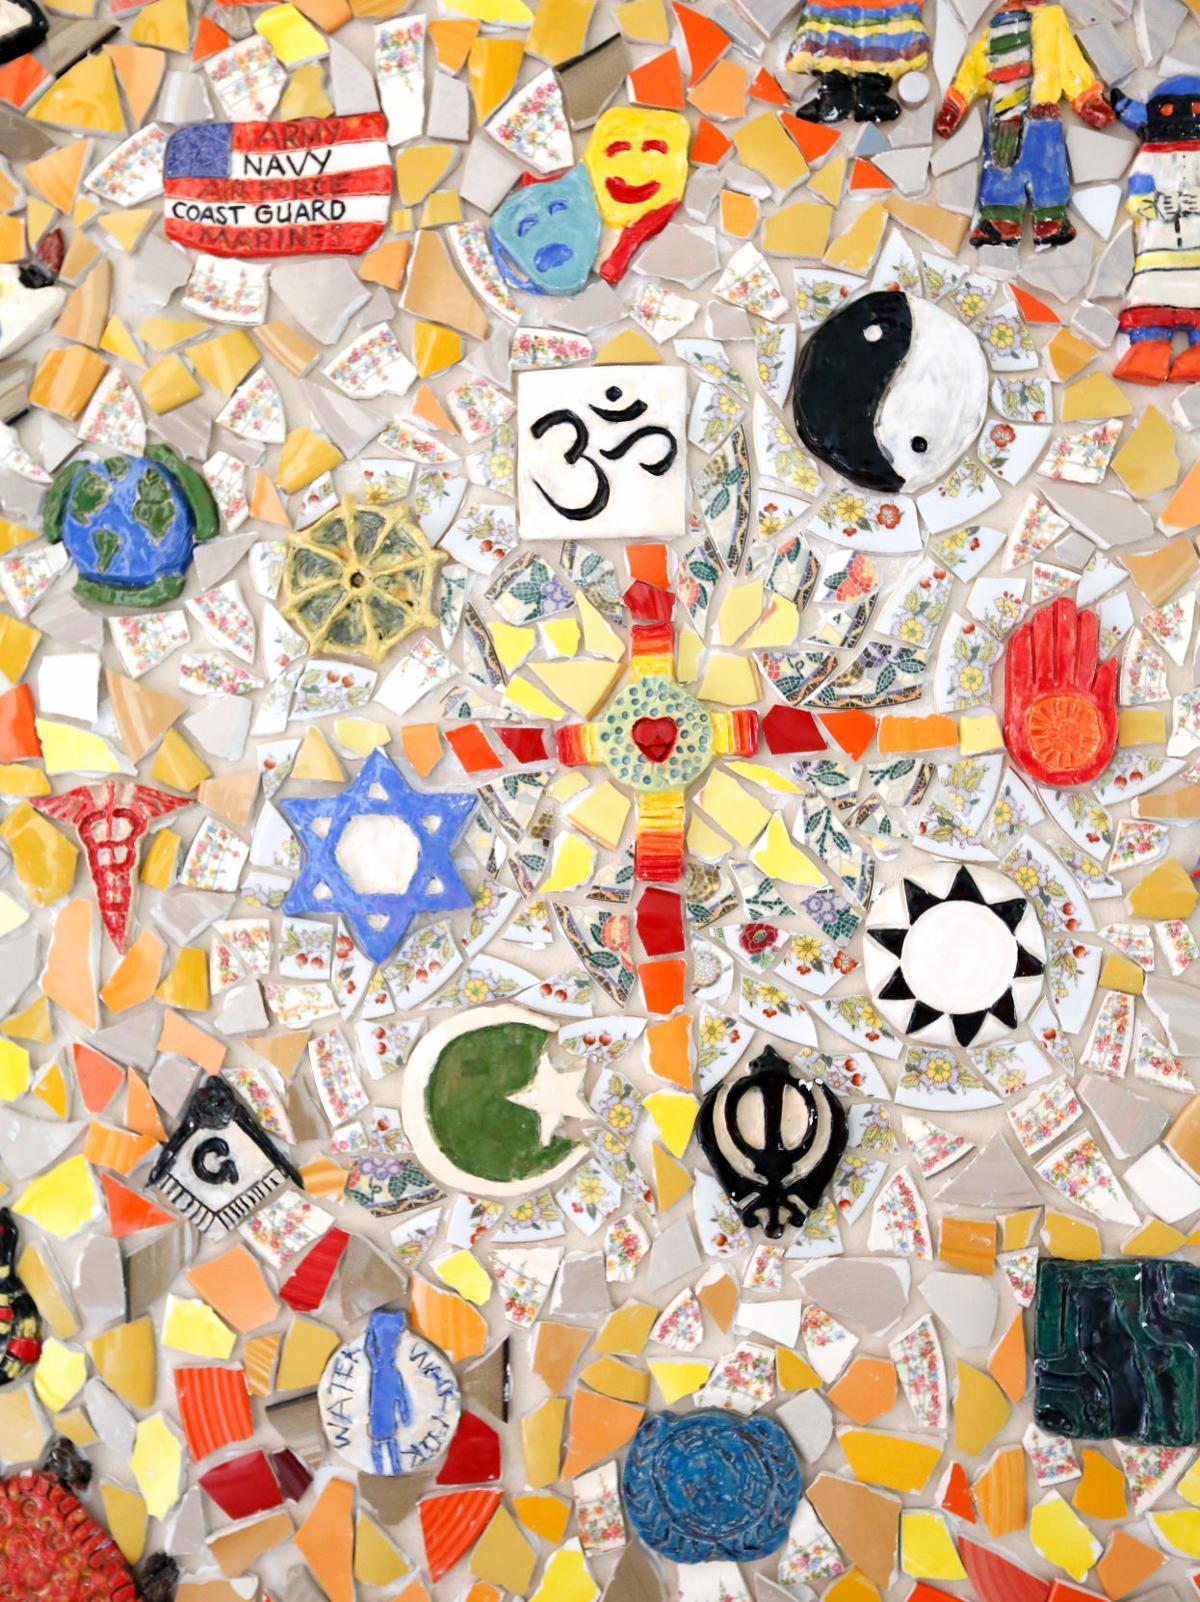 charleston catholic comes together to create colorful